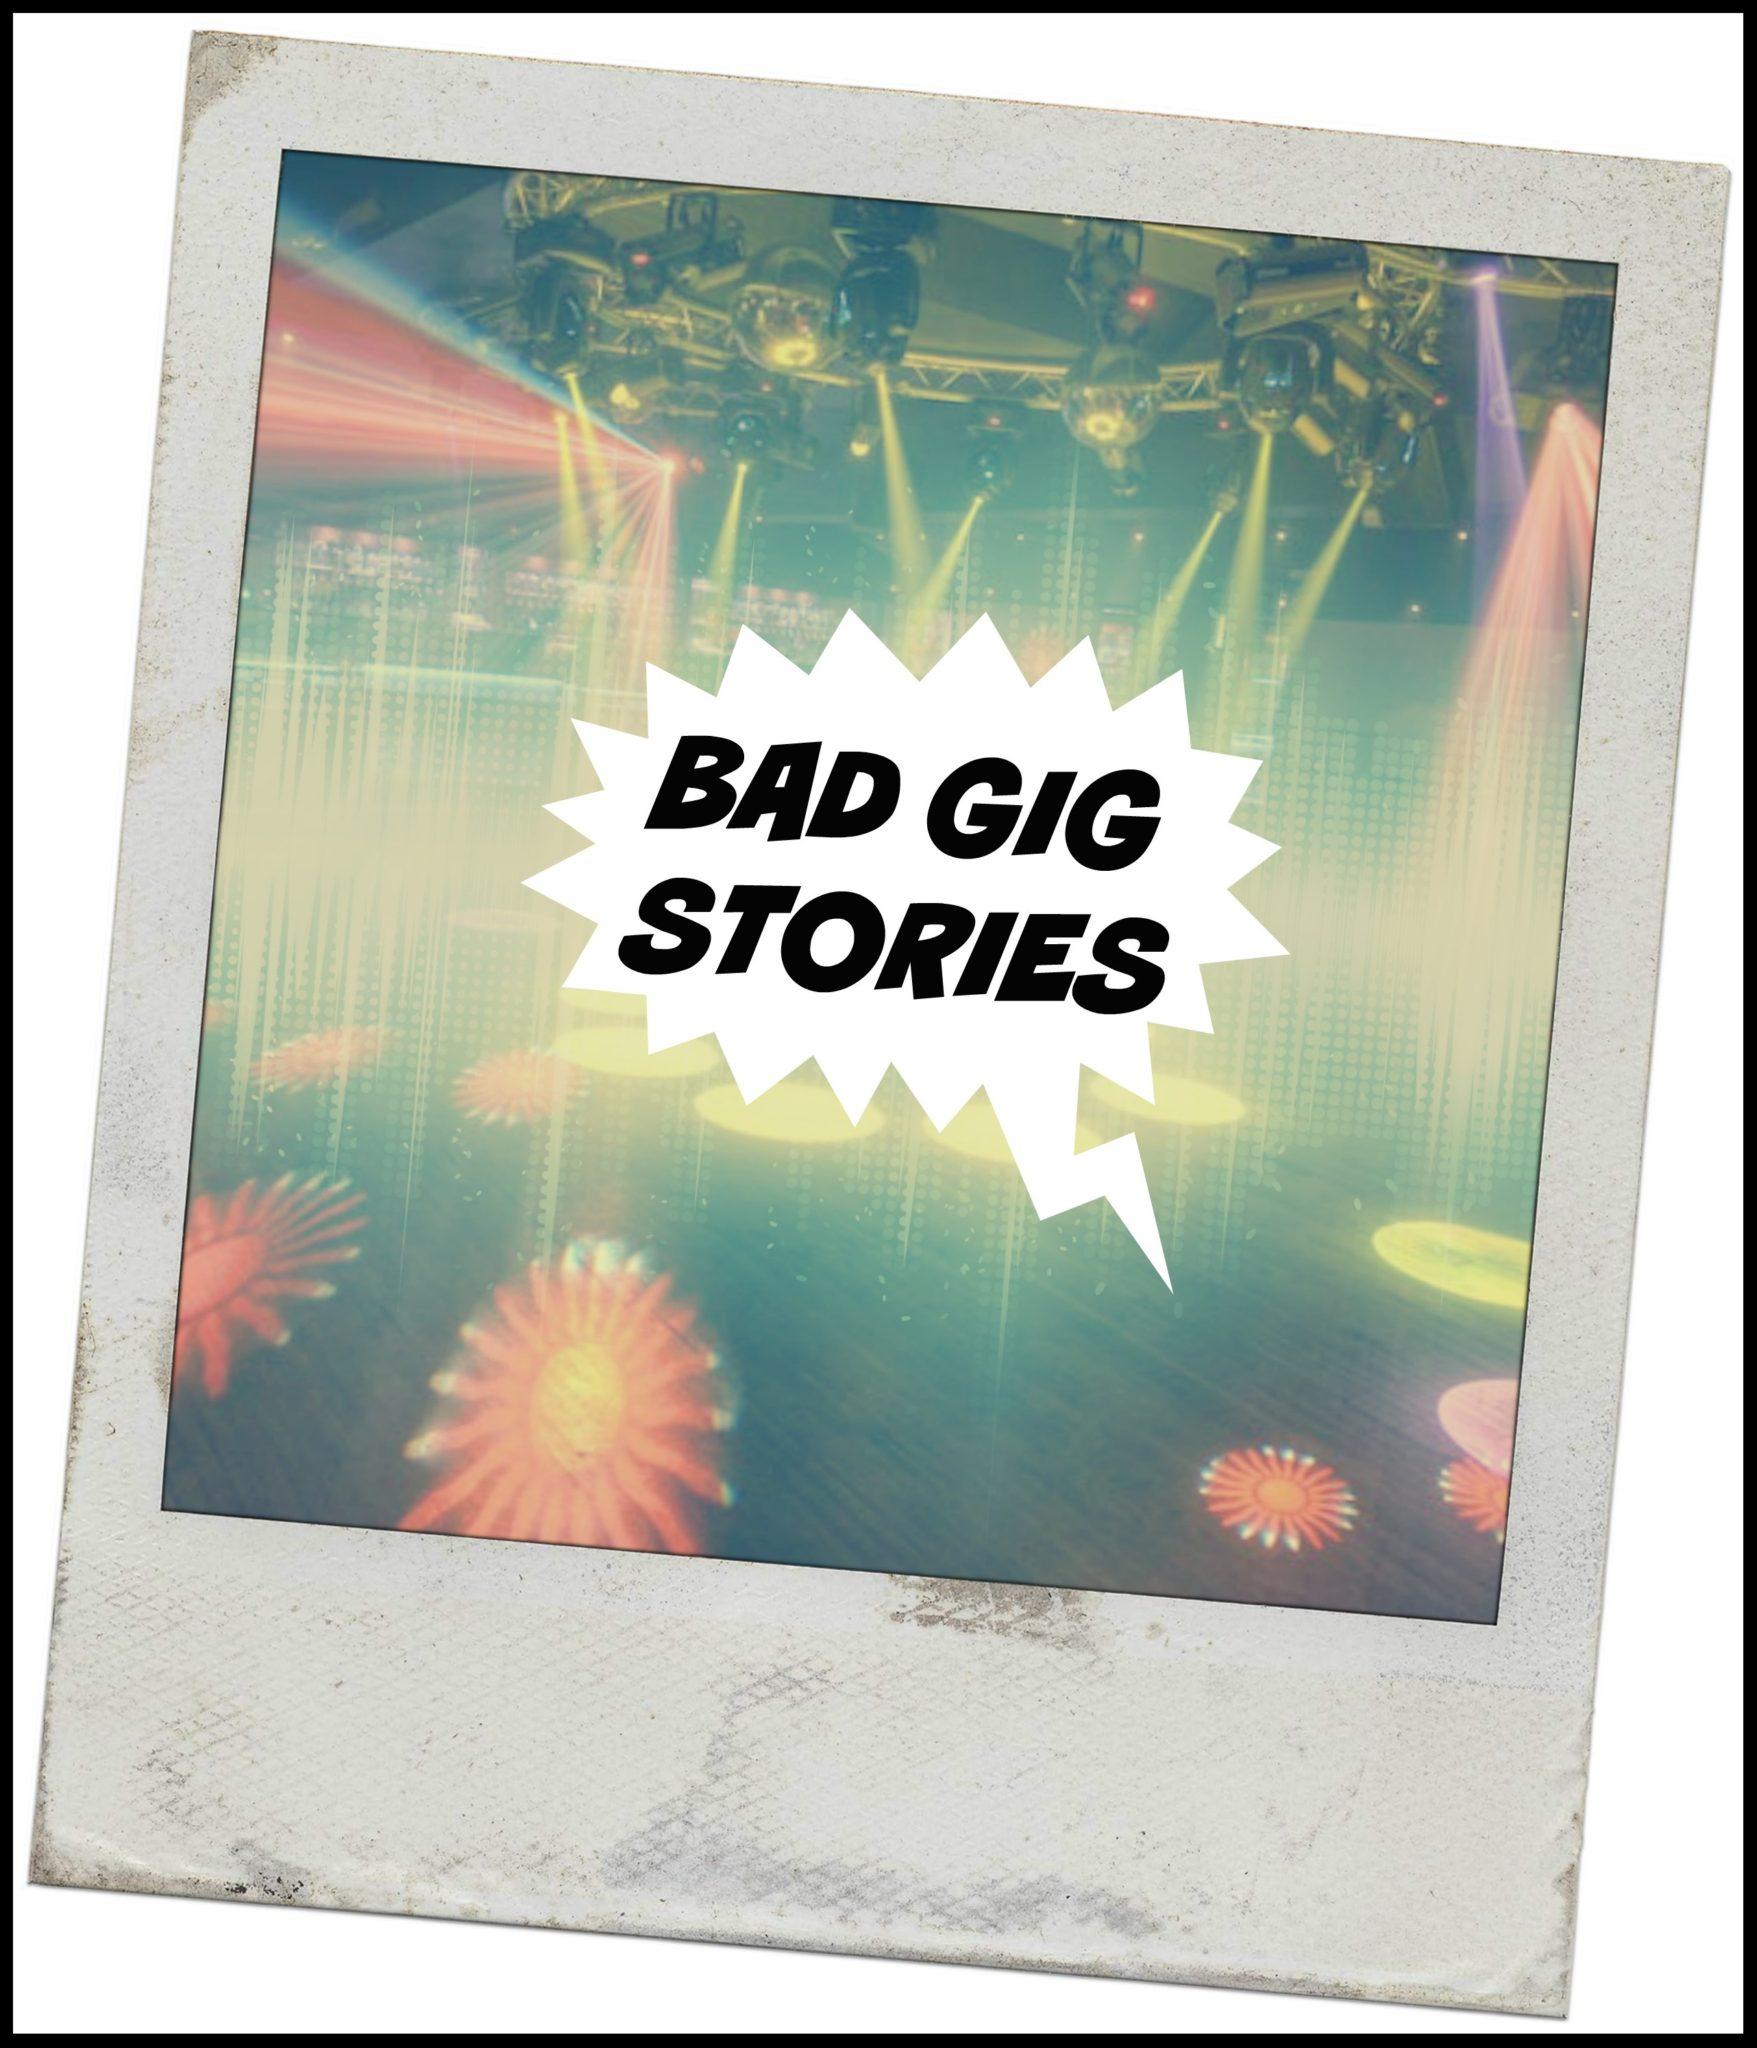 PDJ 017 – Bad Gig Stories!